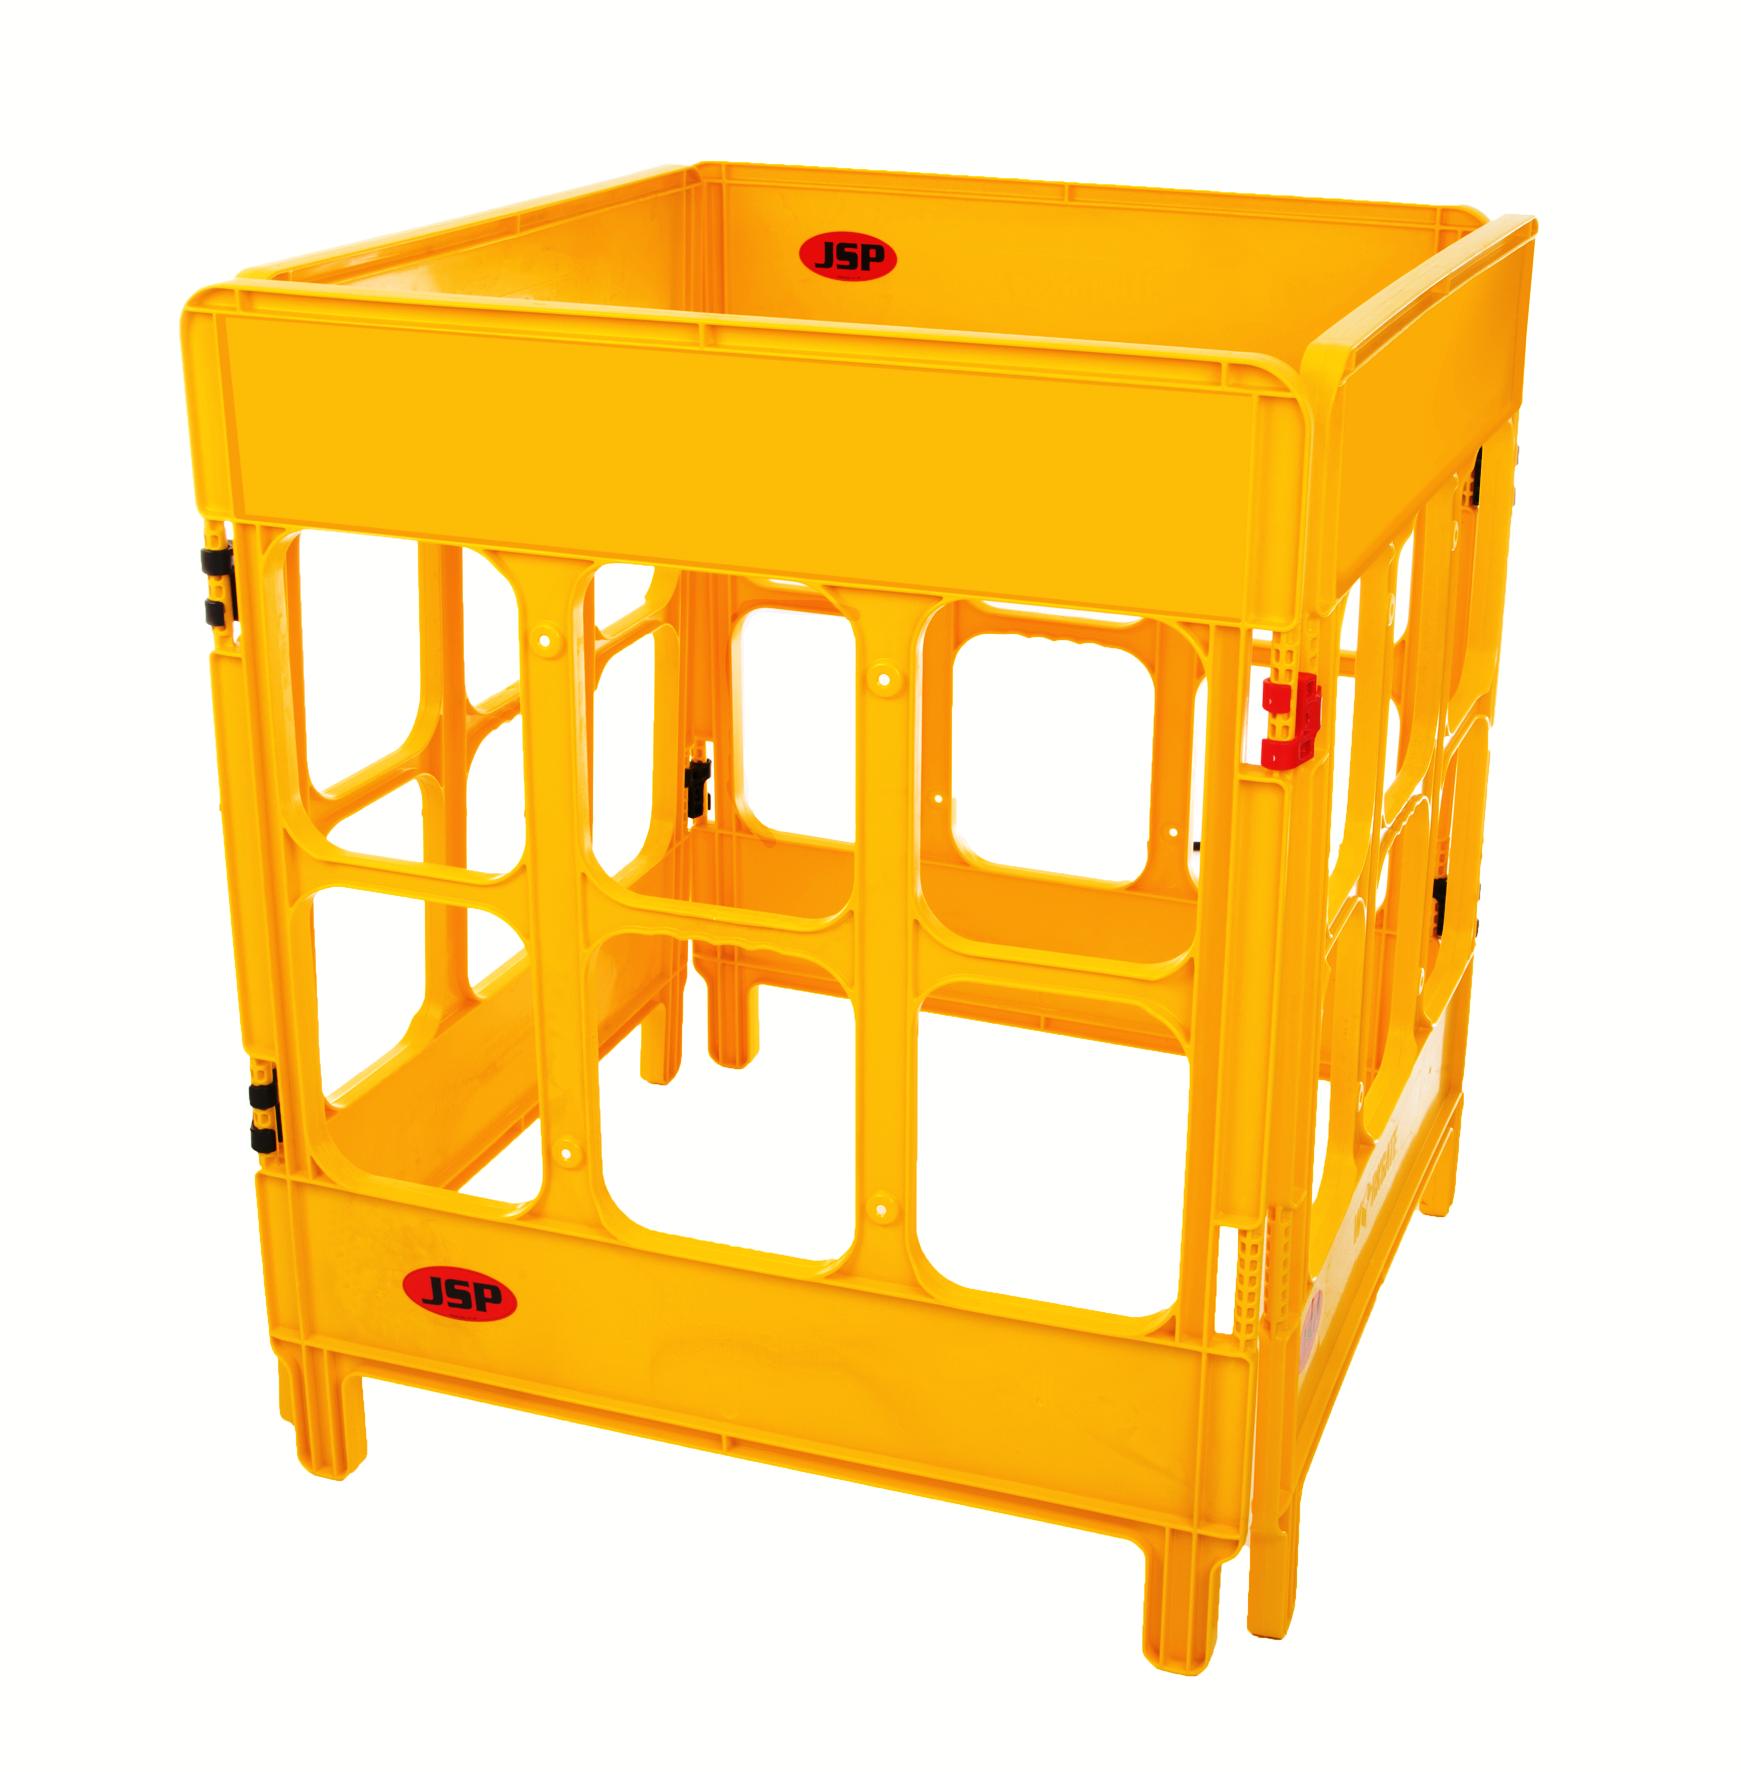 JSP 4-gate foldable polypropylene work barriers - 9